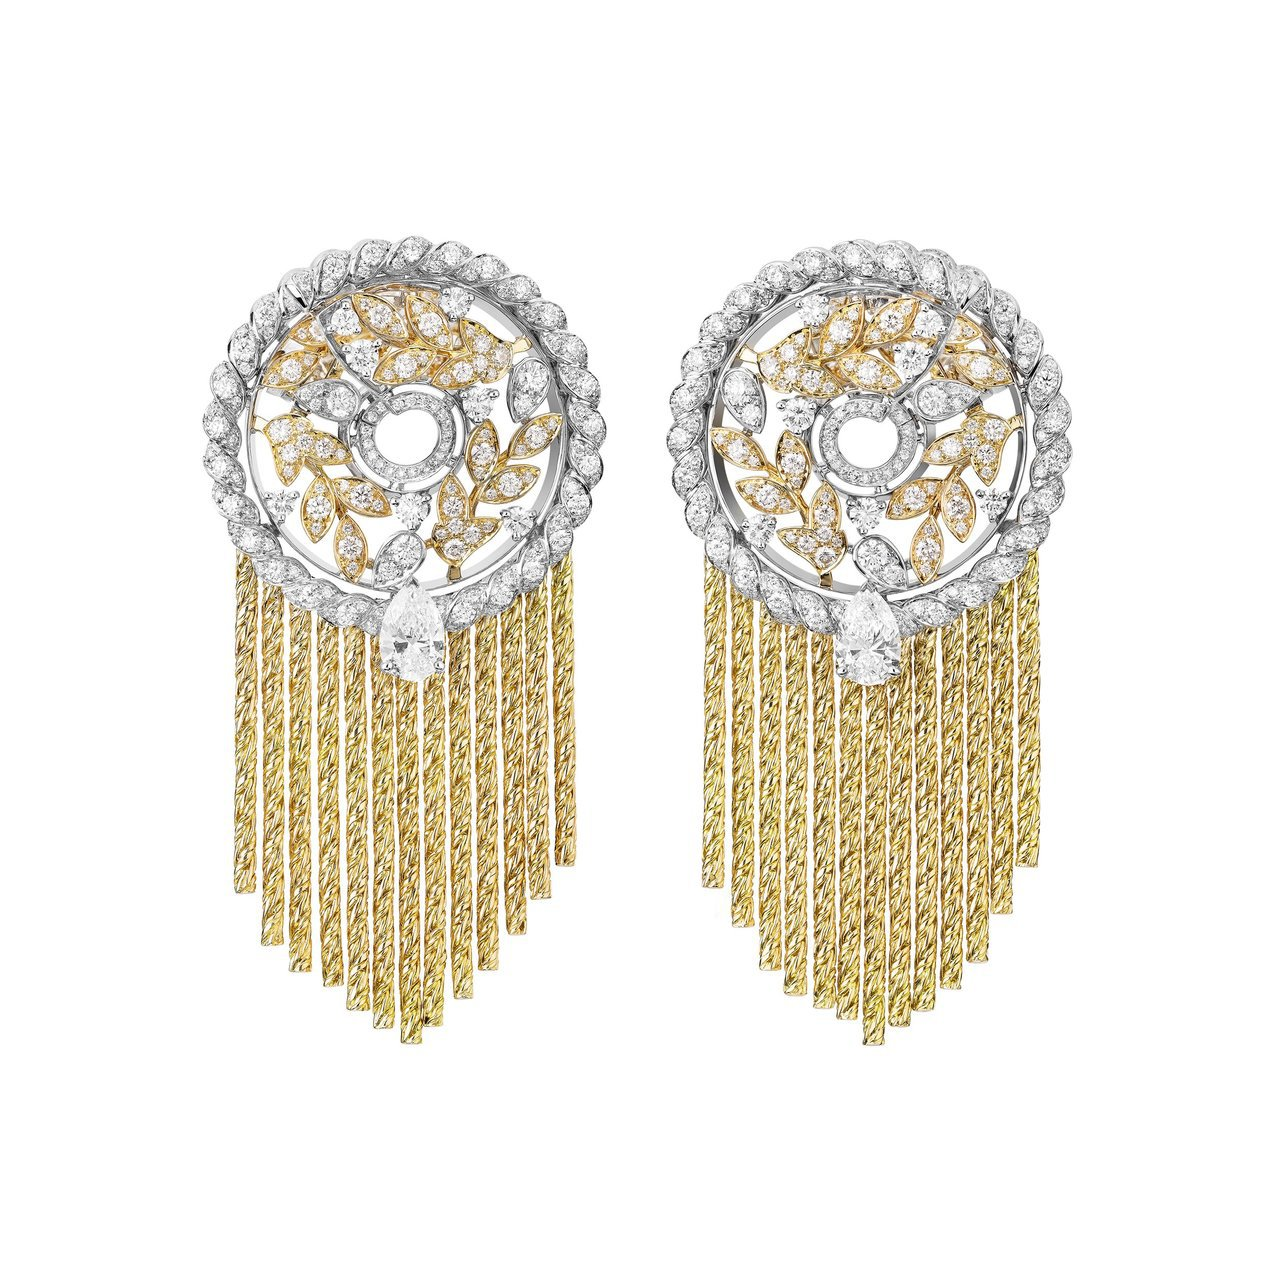 Blé Gabrielle耳環,用柔韌的K金流蘇呈現麥浪隨風搖曳之美,539萬3...